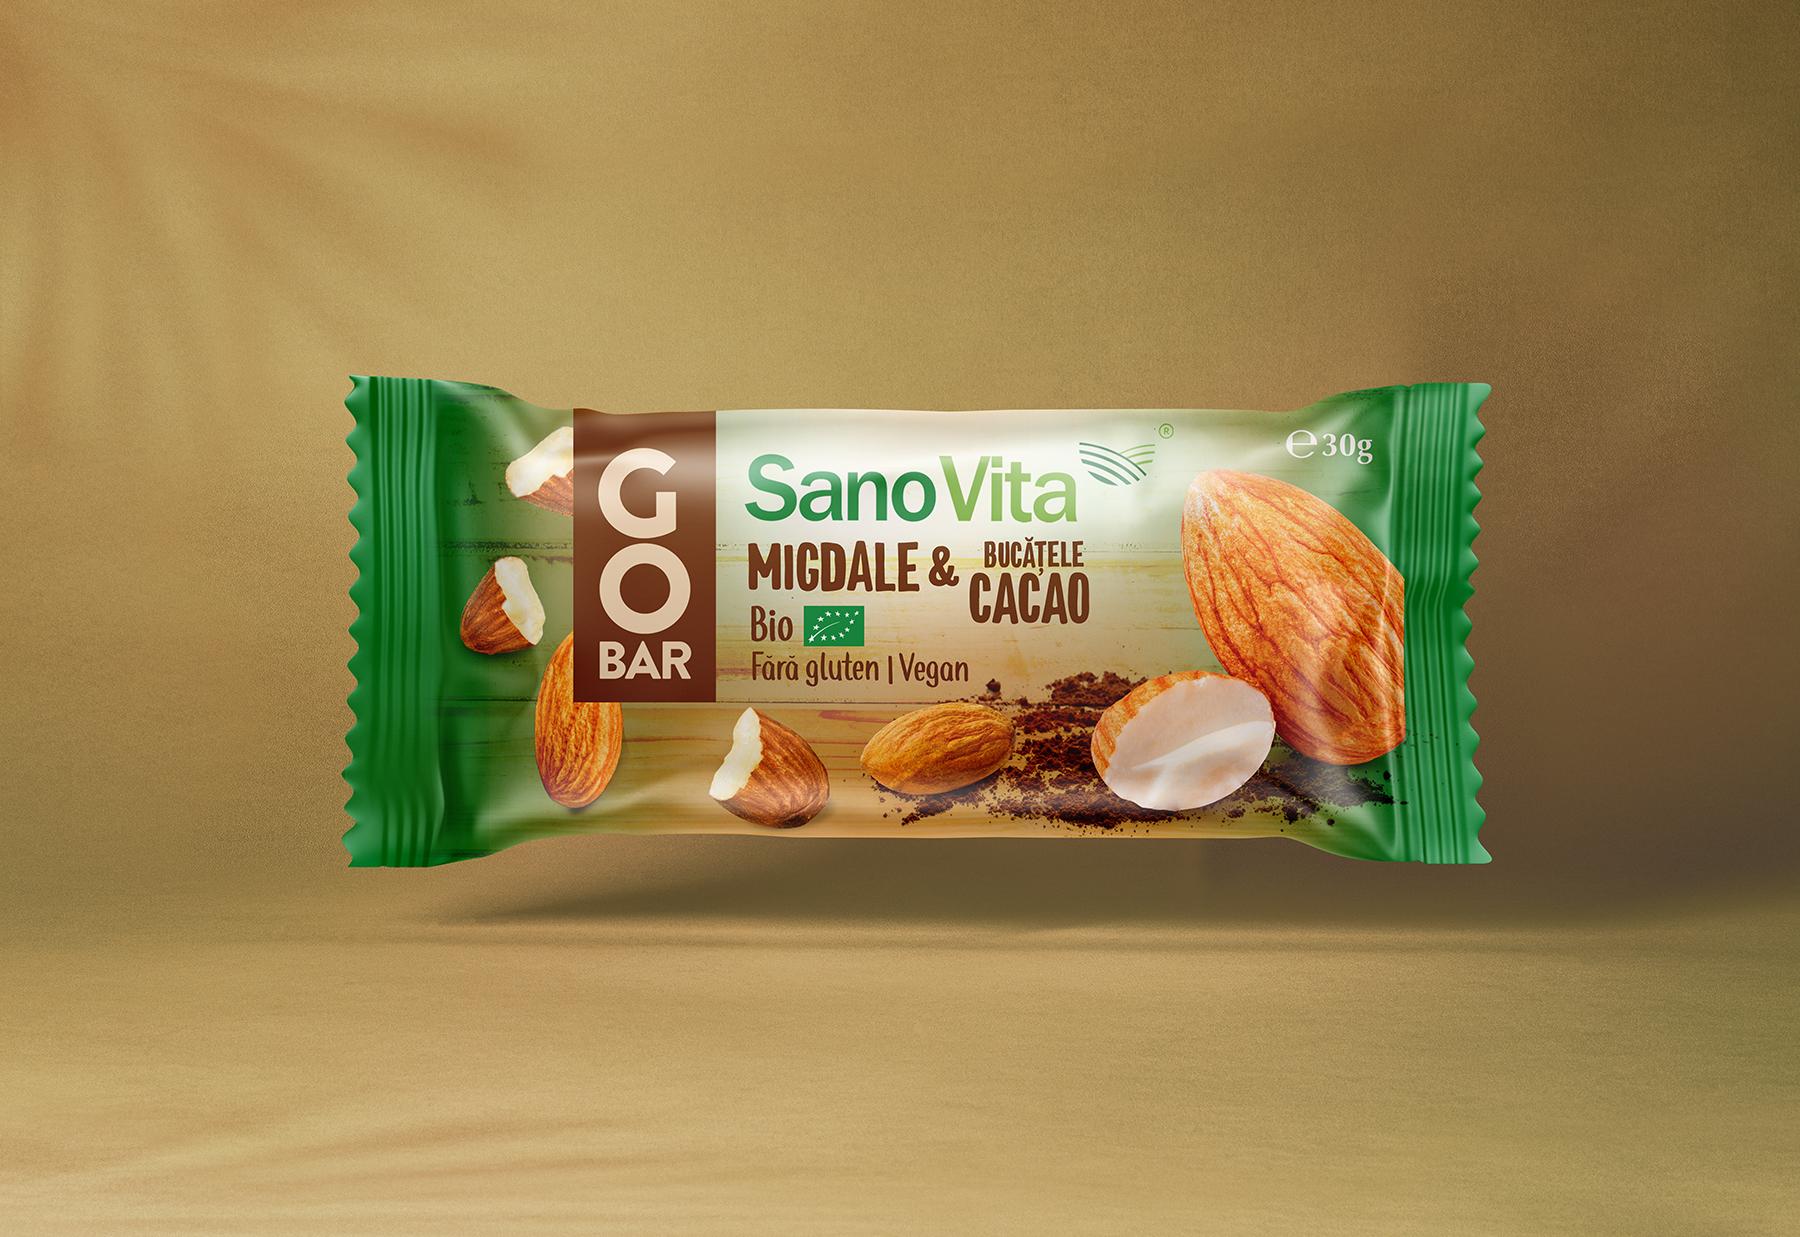 Almonds and Caco Ribs packaging design | SanoVita